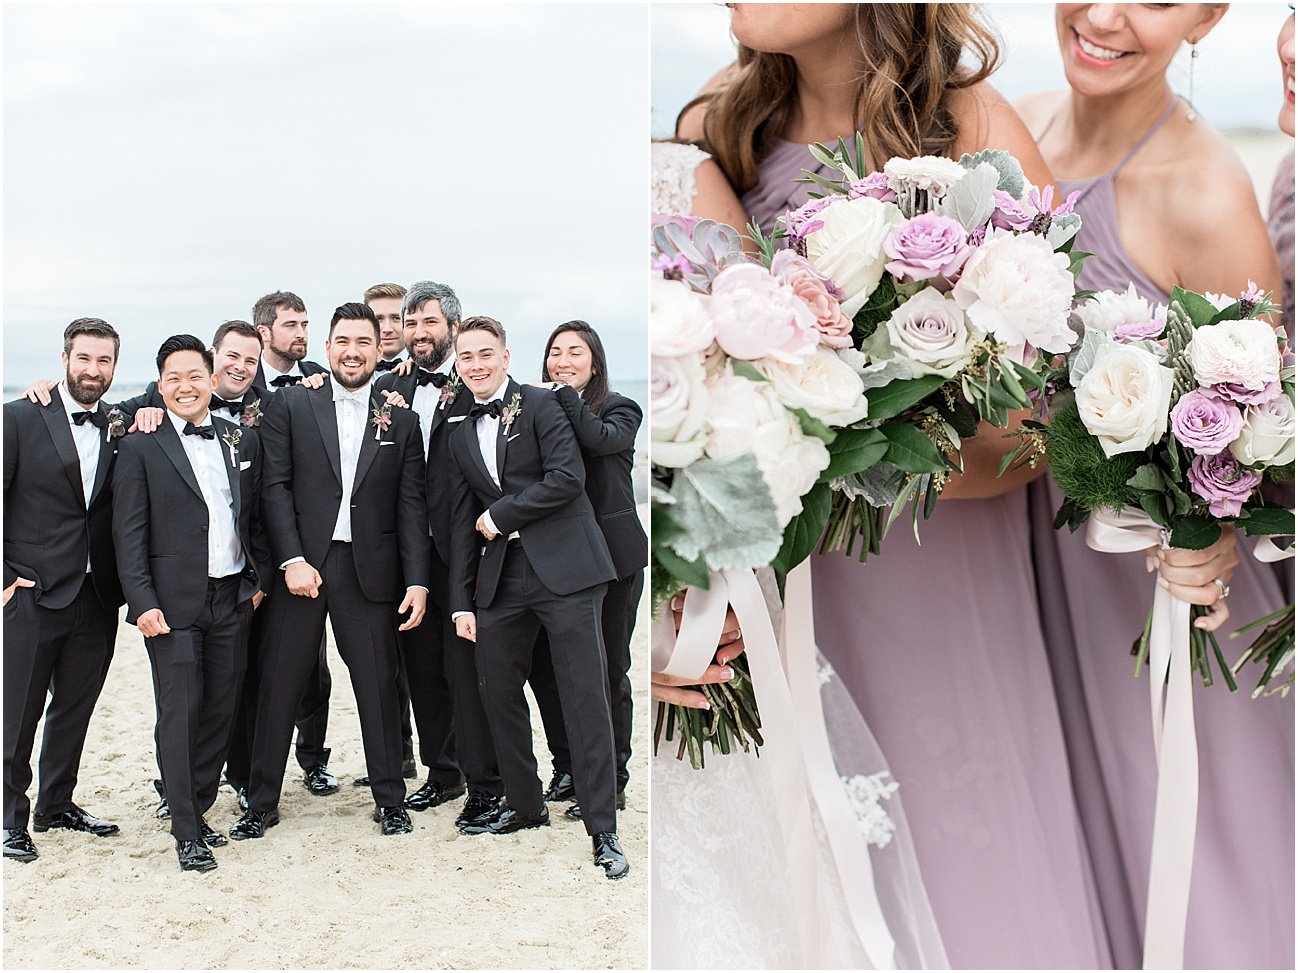 courtney_kurt_cape_cod_popponessett_inn_dowses_beach_boston_wedding_meredith_jane_photography_photo_0043.jpg